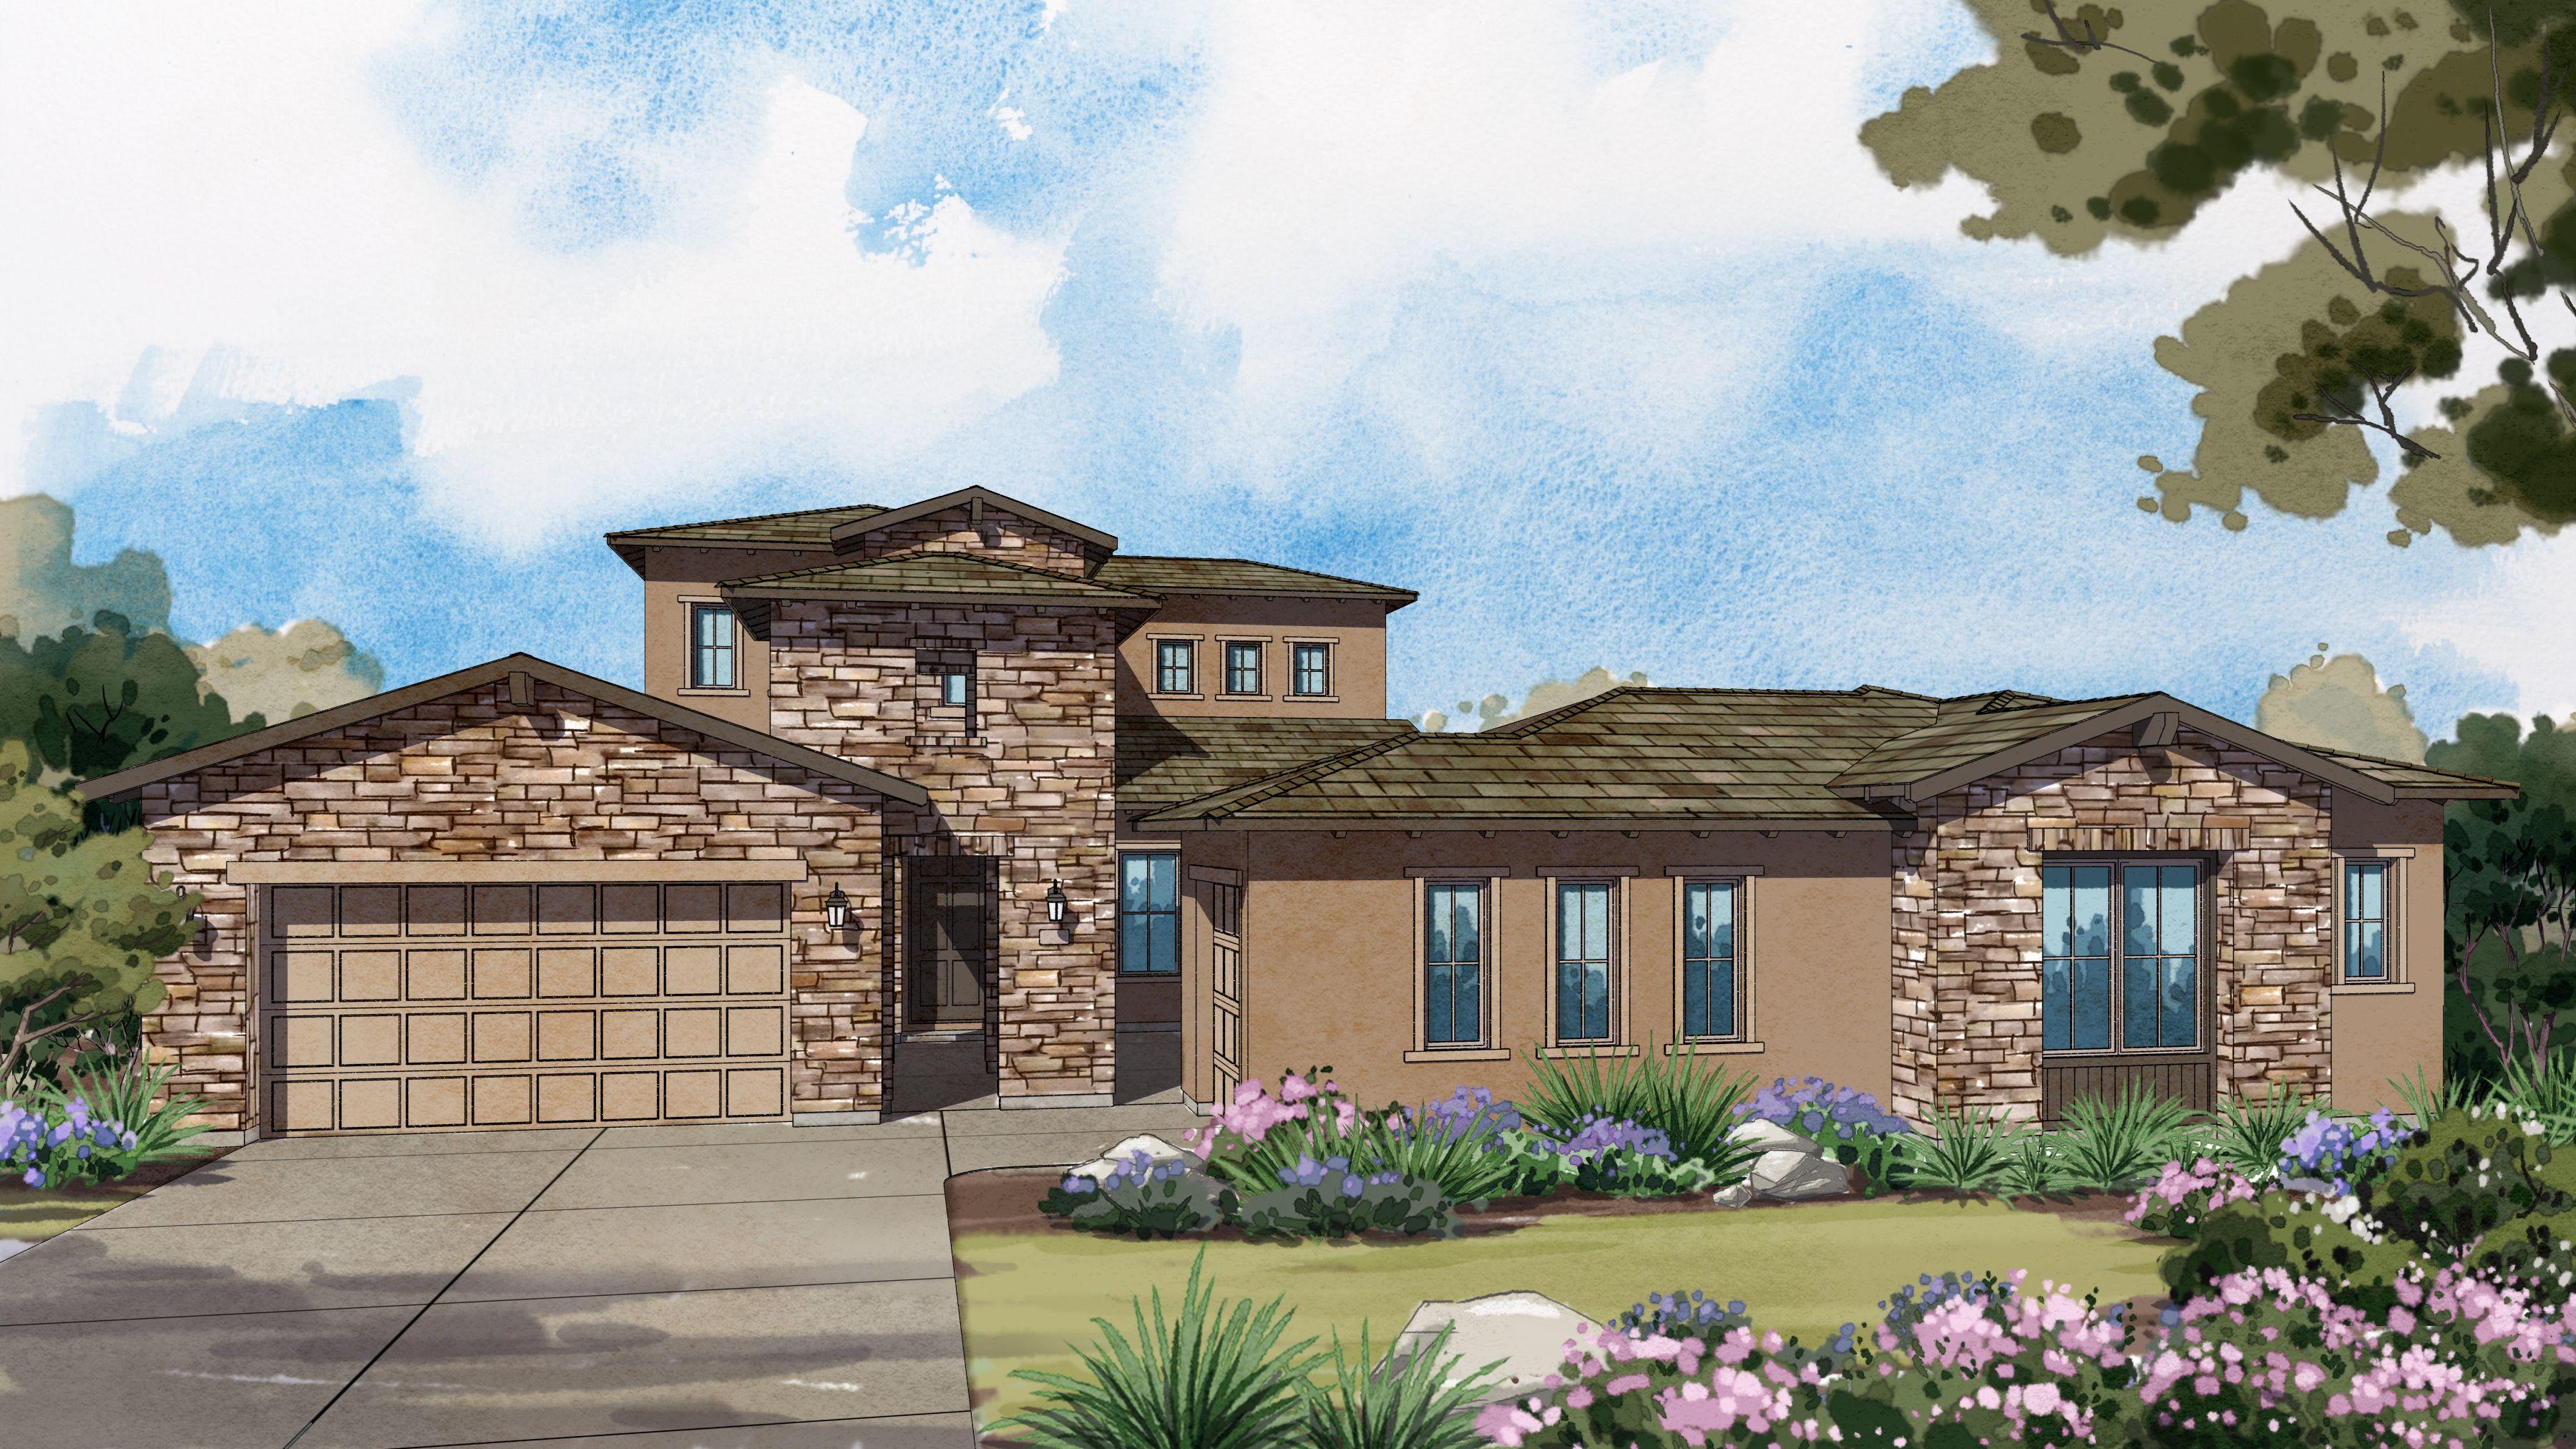 Single Family for Sale at Vintage 38 - Pinot Reserve 374 Willard Court El Dorado Hills, California 95762 United States